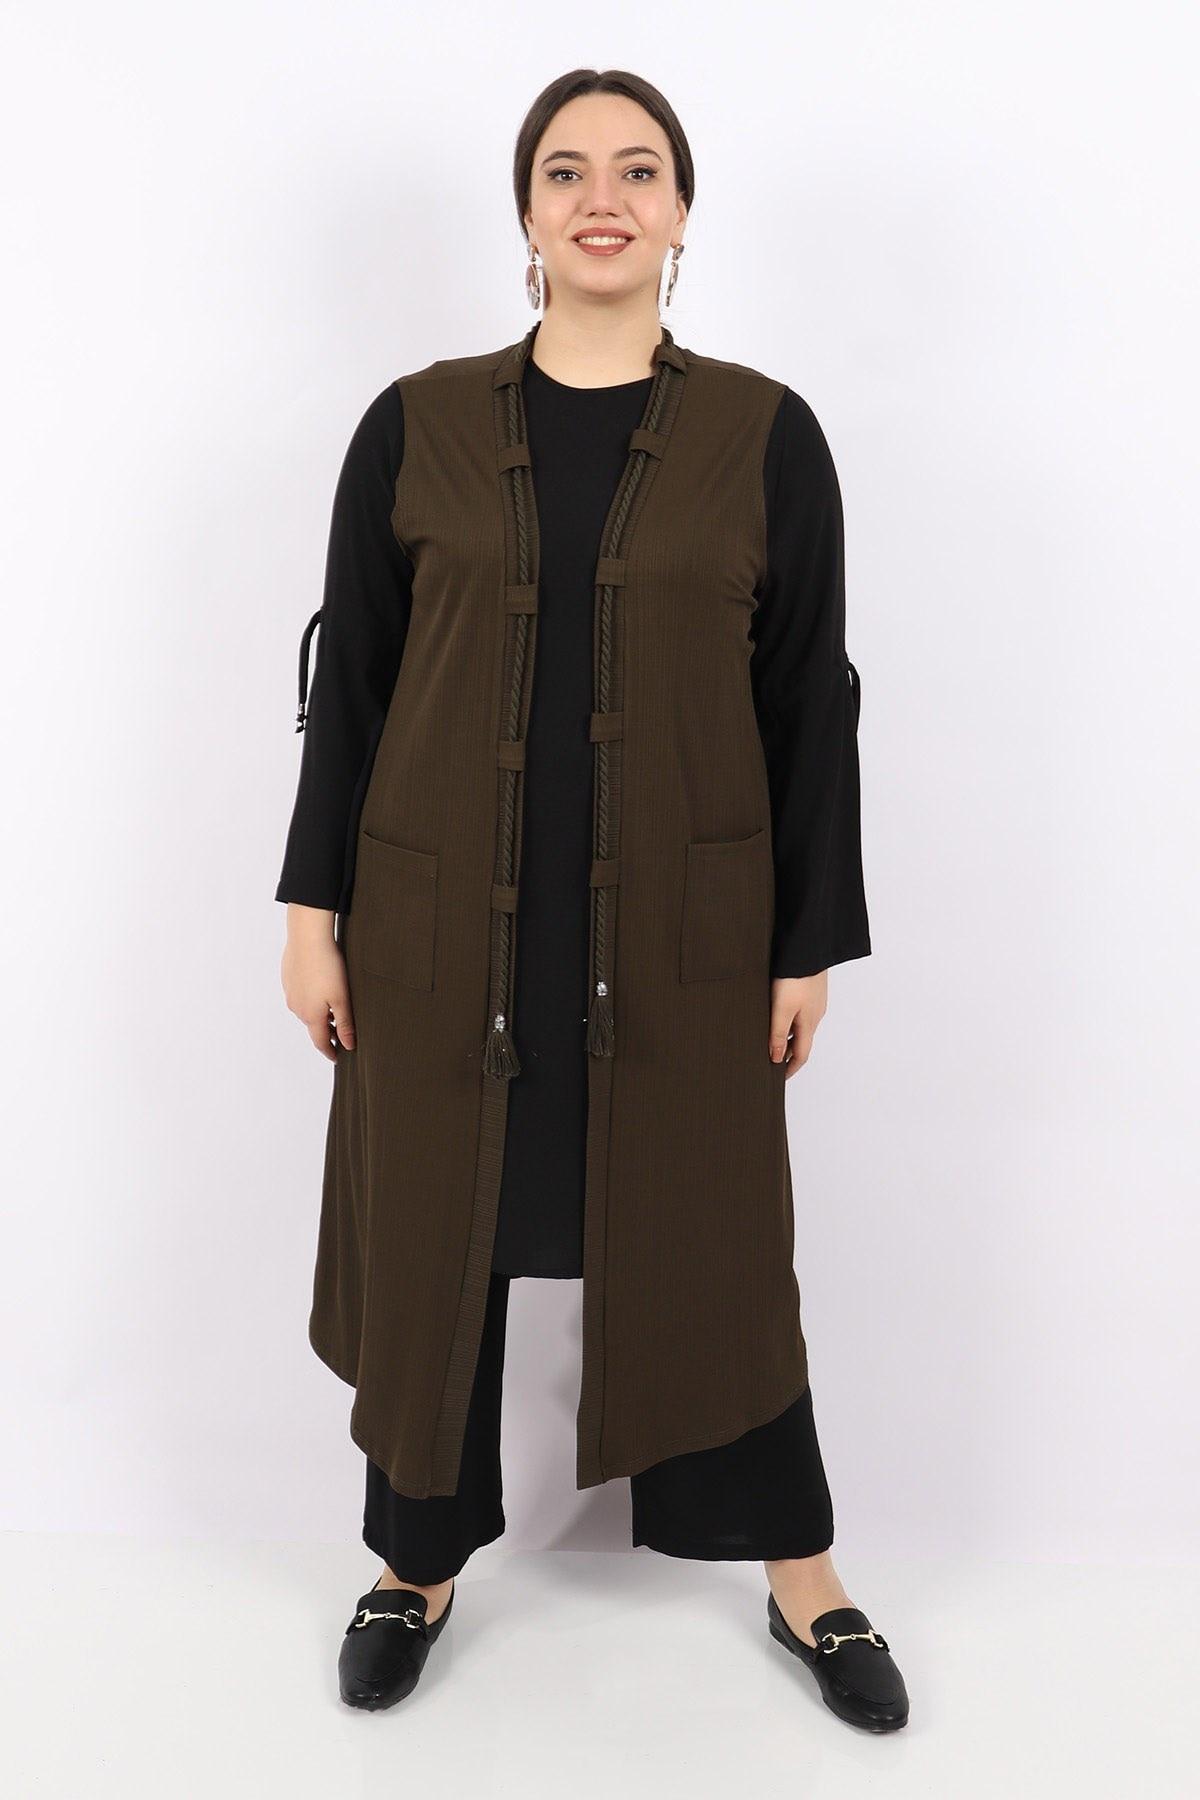 Plus Size Vest KadoModa Khaki